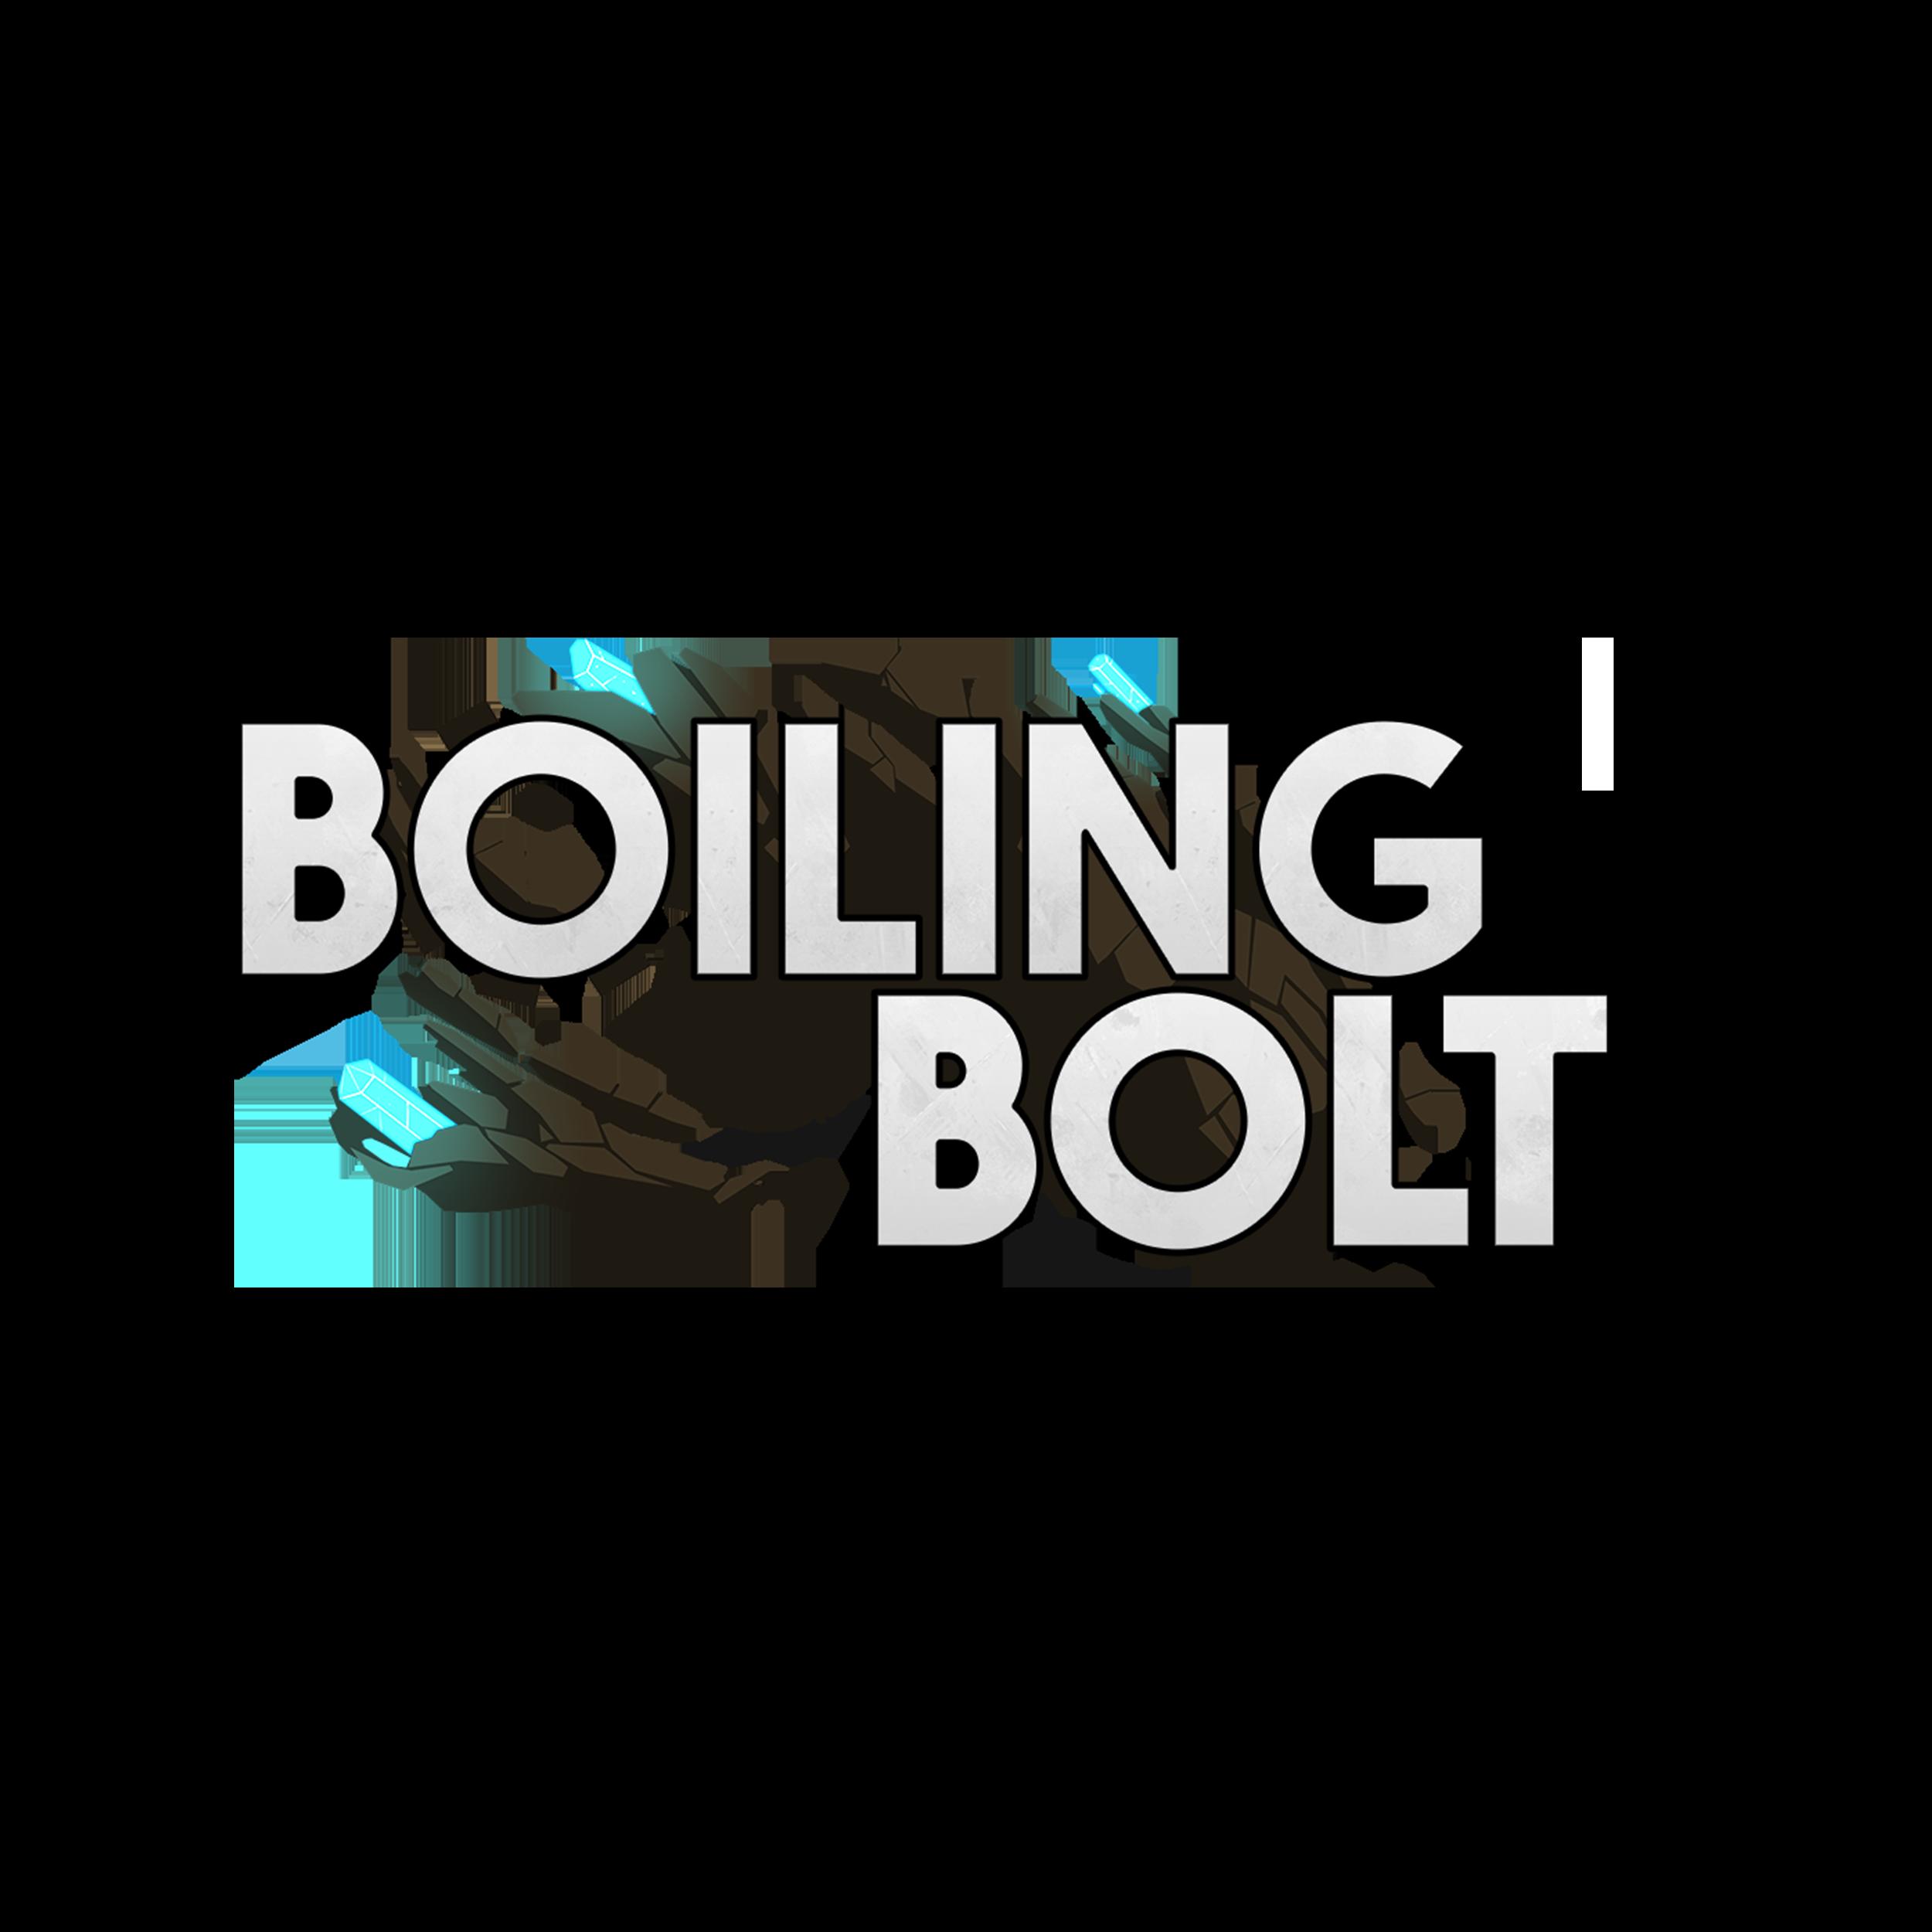 Boiling Bolt logo